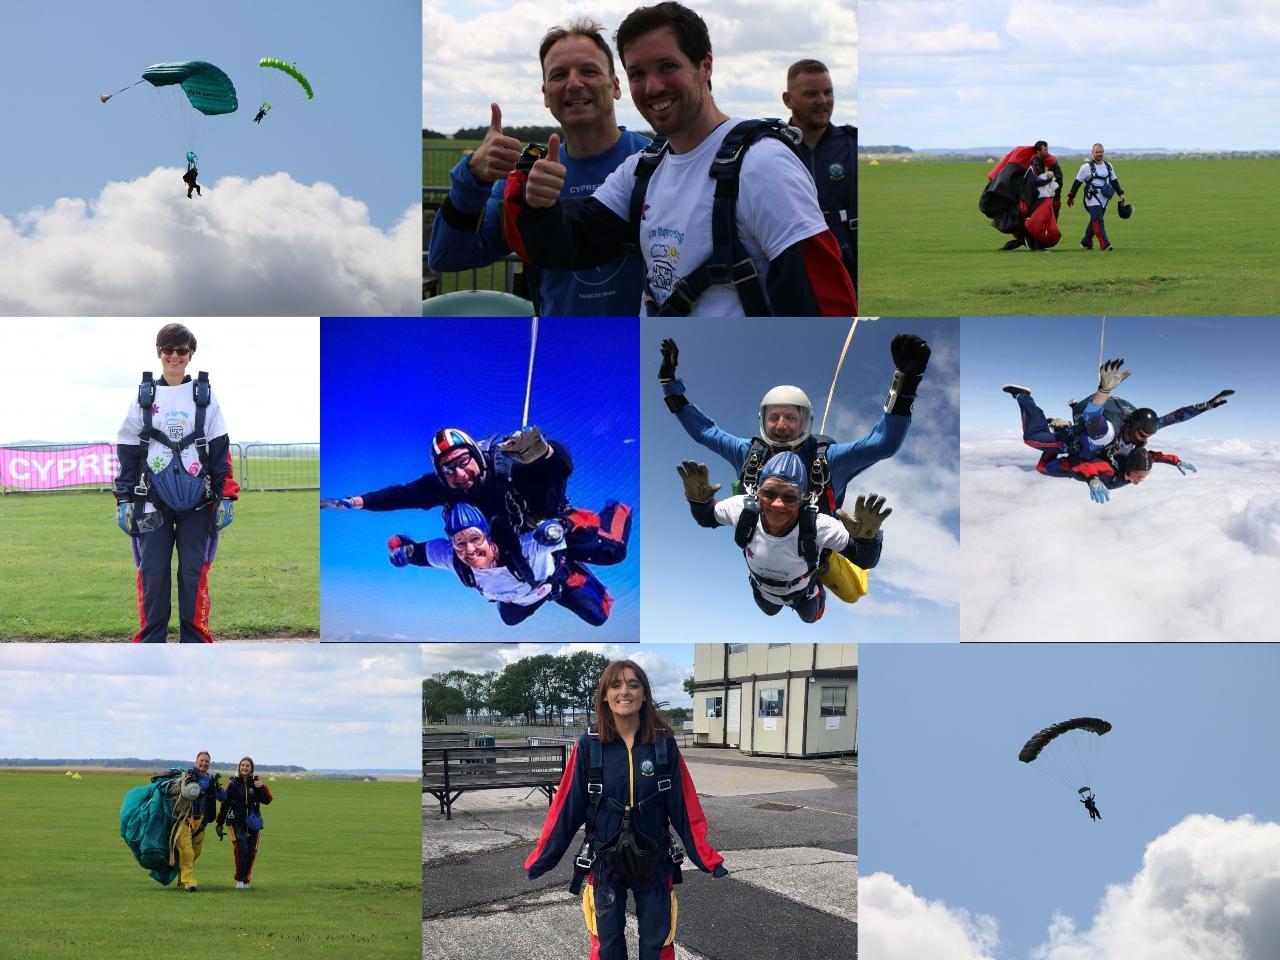 Skydive collage.jpg